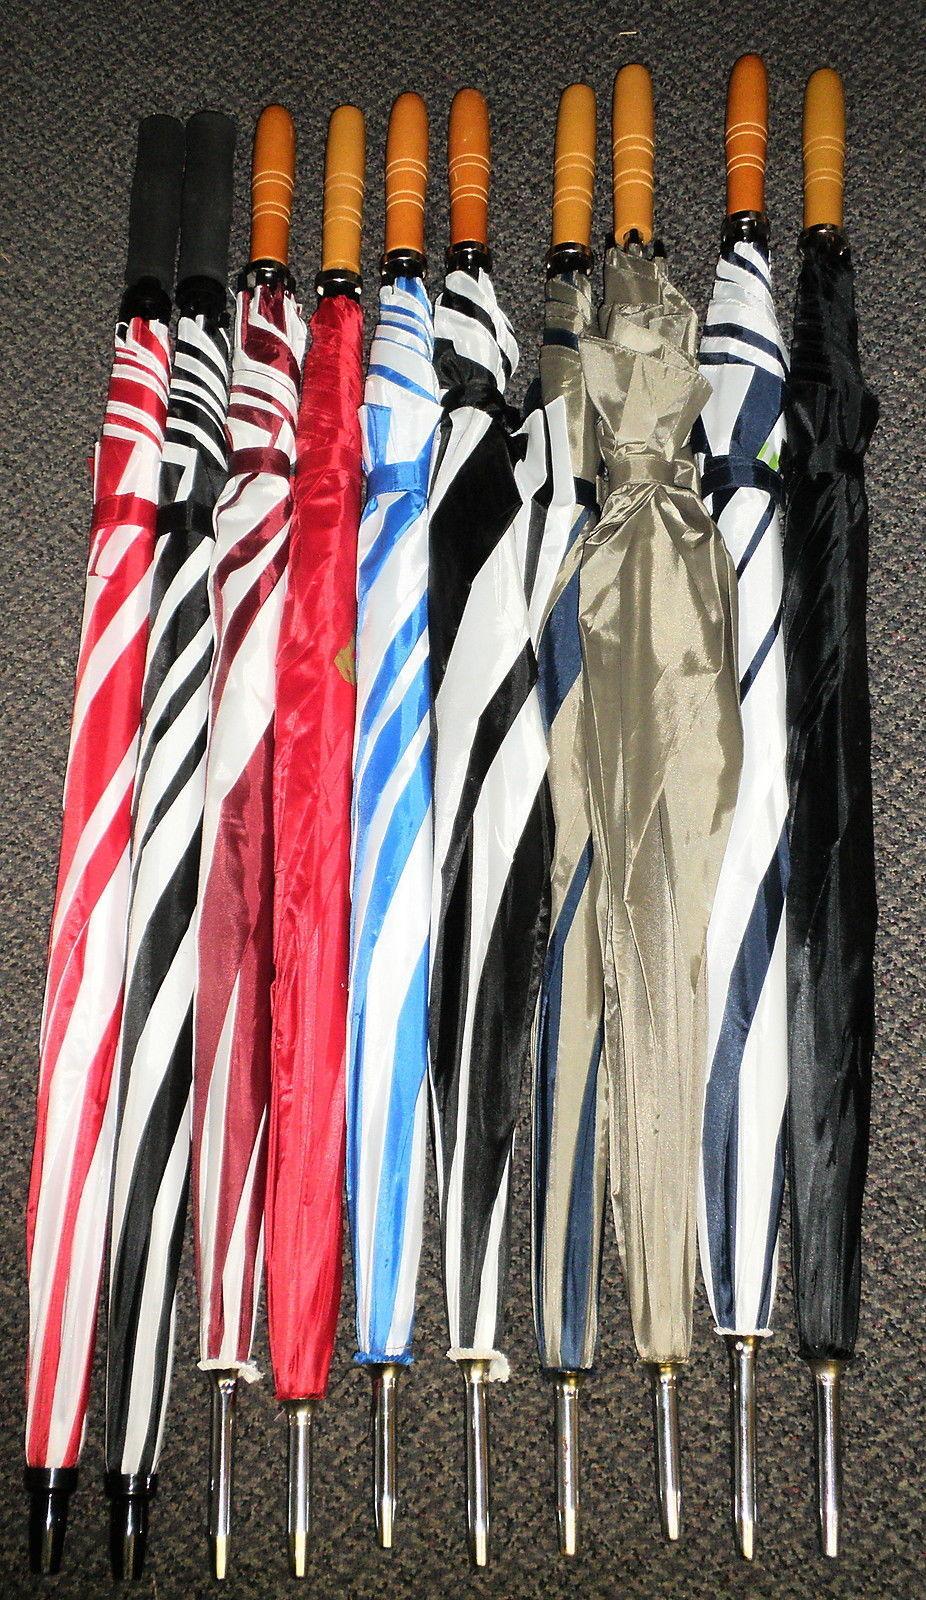 "Vitronic 46"" X 39 3/4"" Large Umbrella - Multi Colored, Variety Logos,"